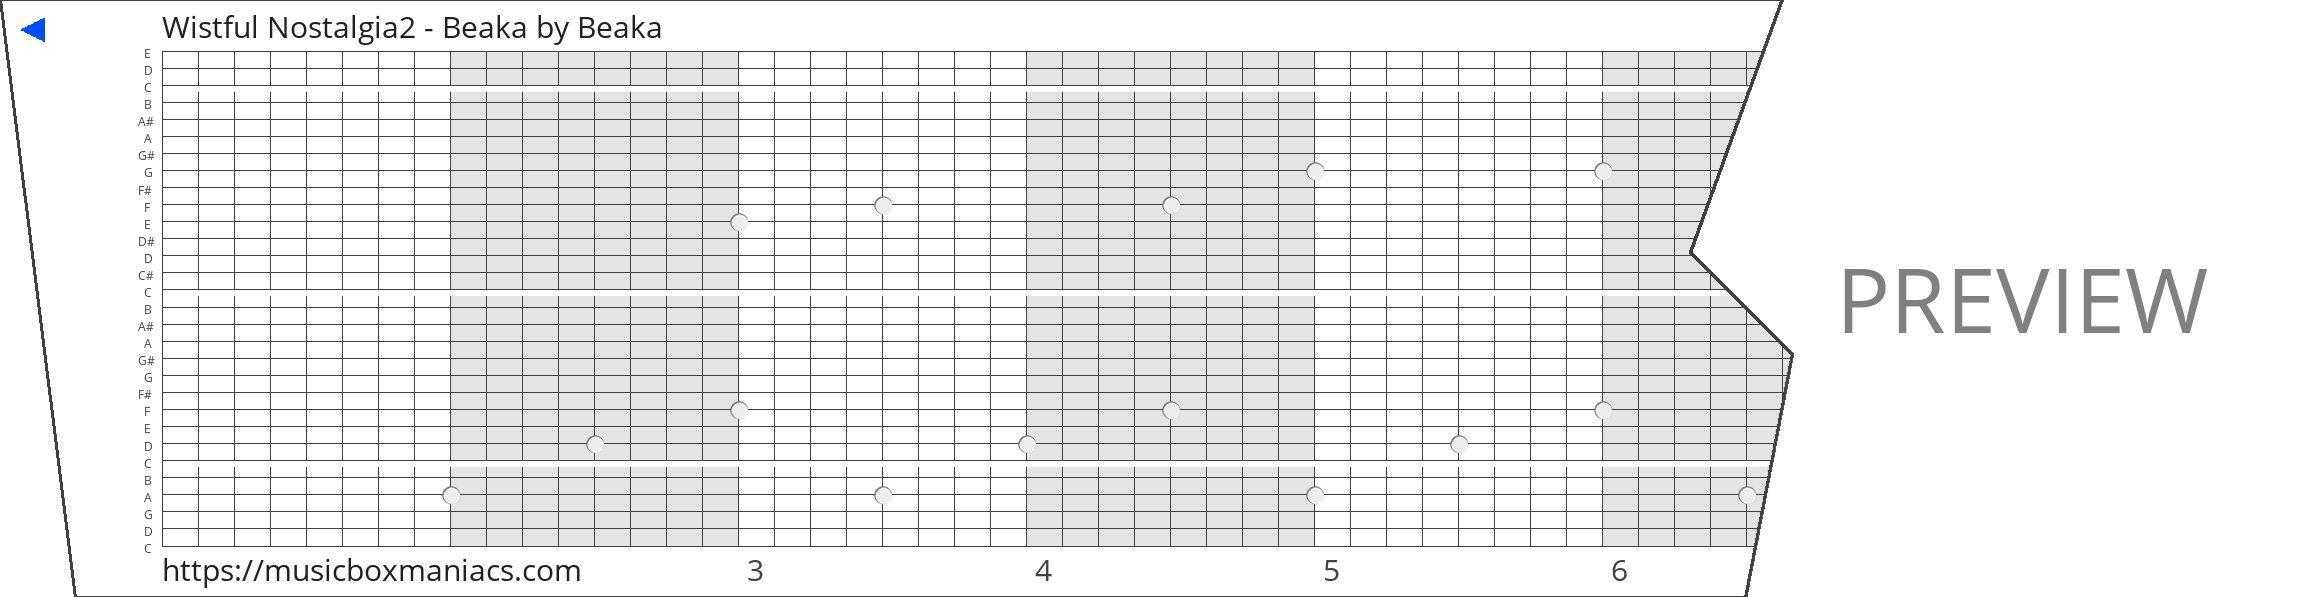 Wistful Nostalgia2 - Beaka 30 note music box paper strip